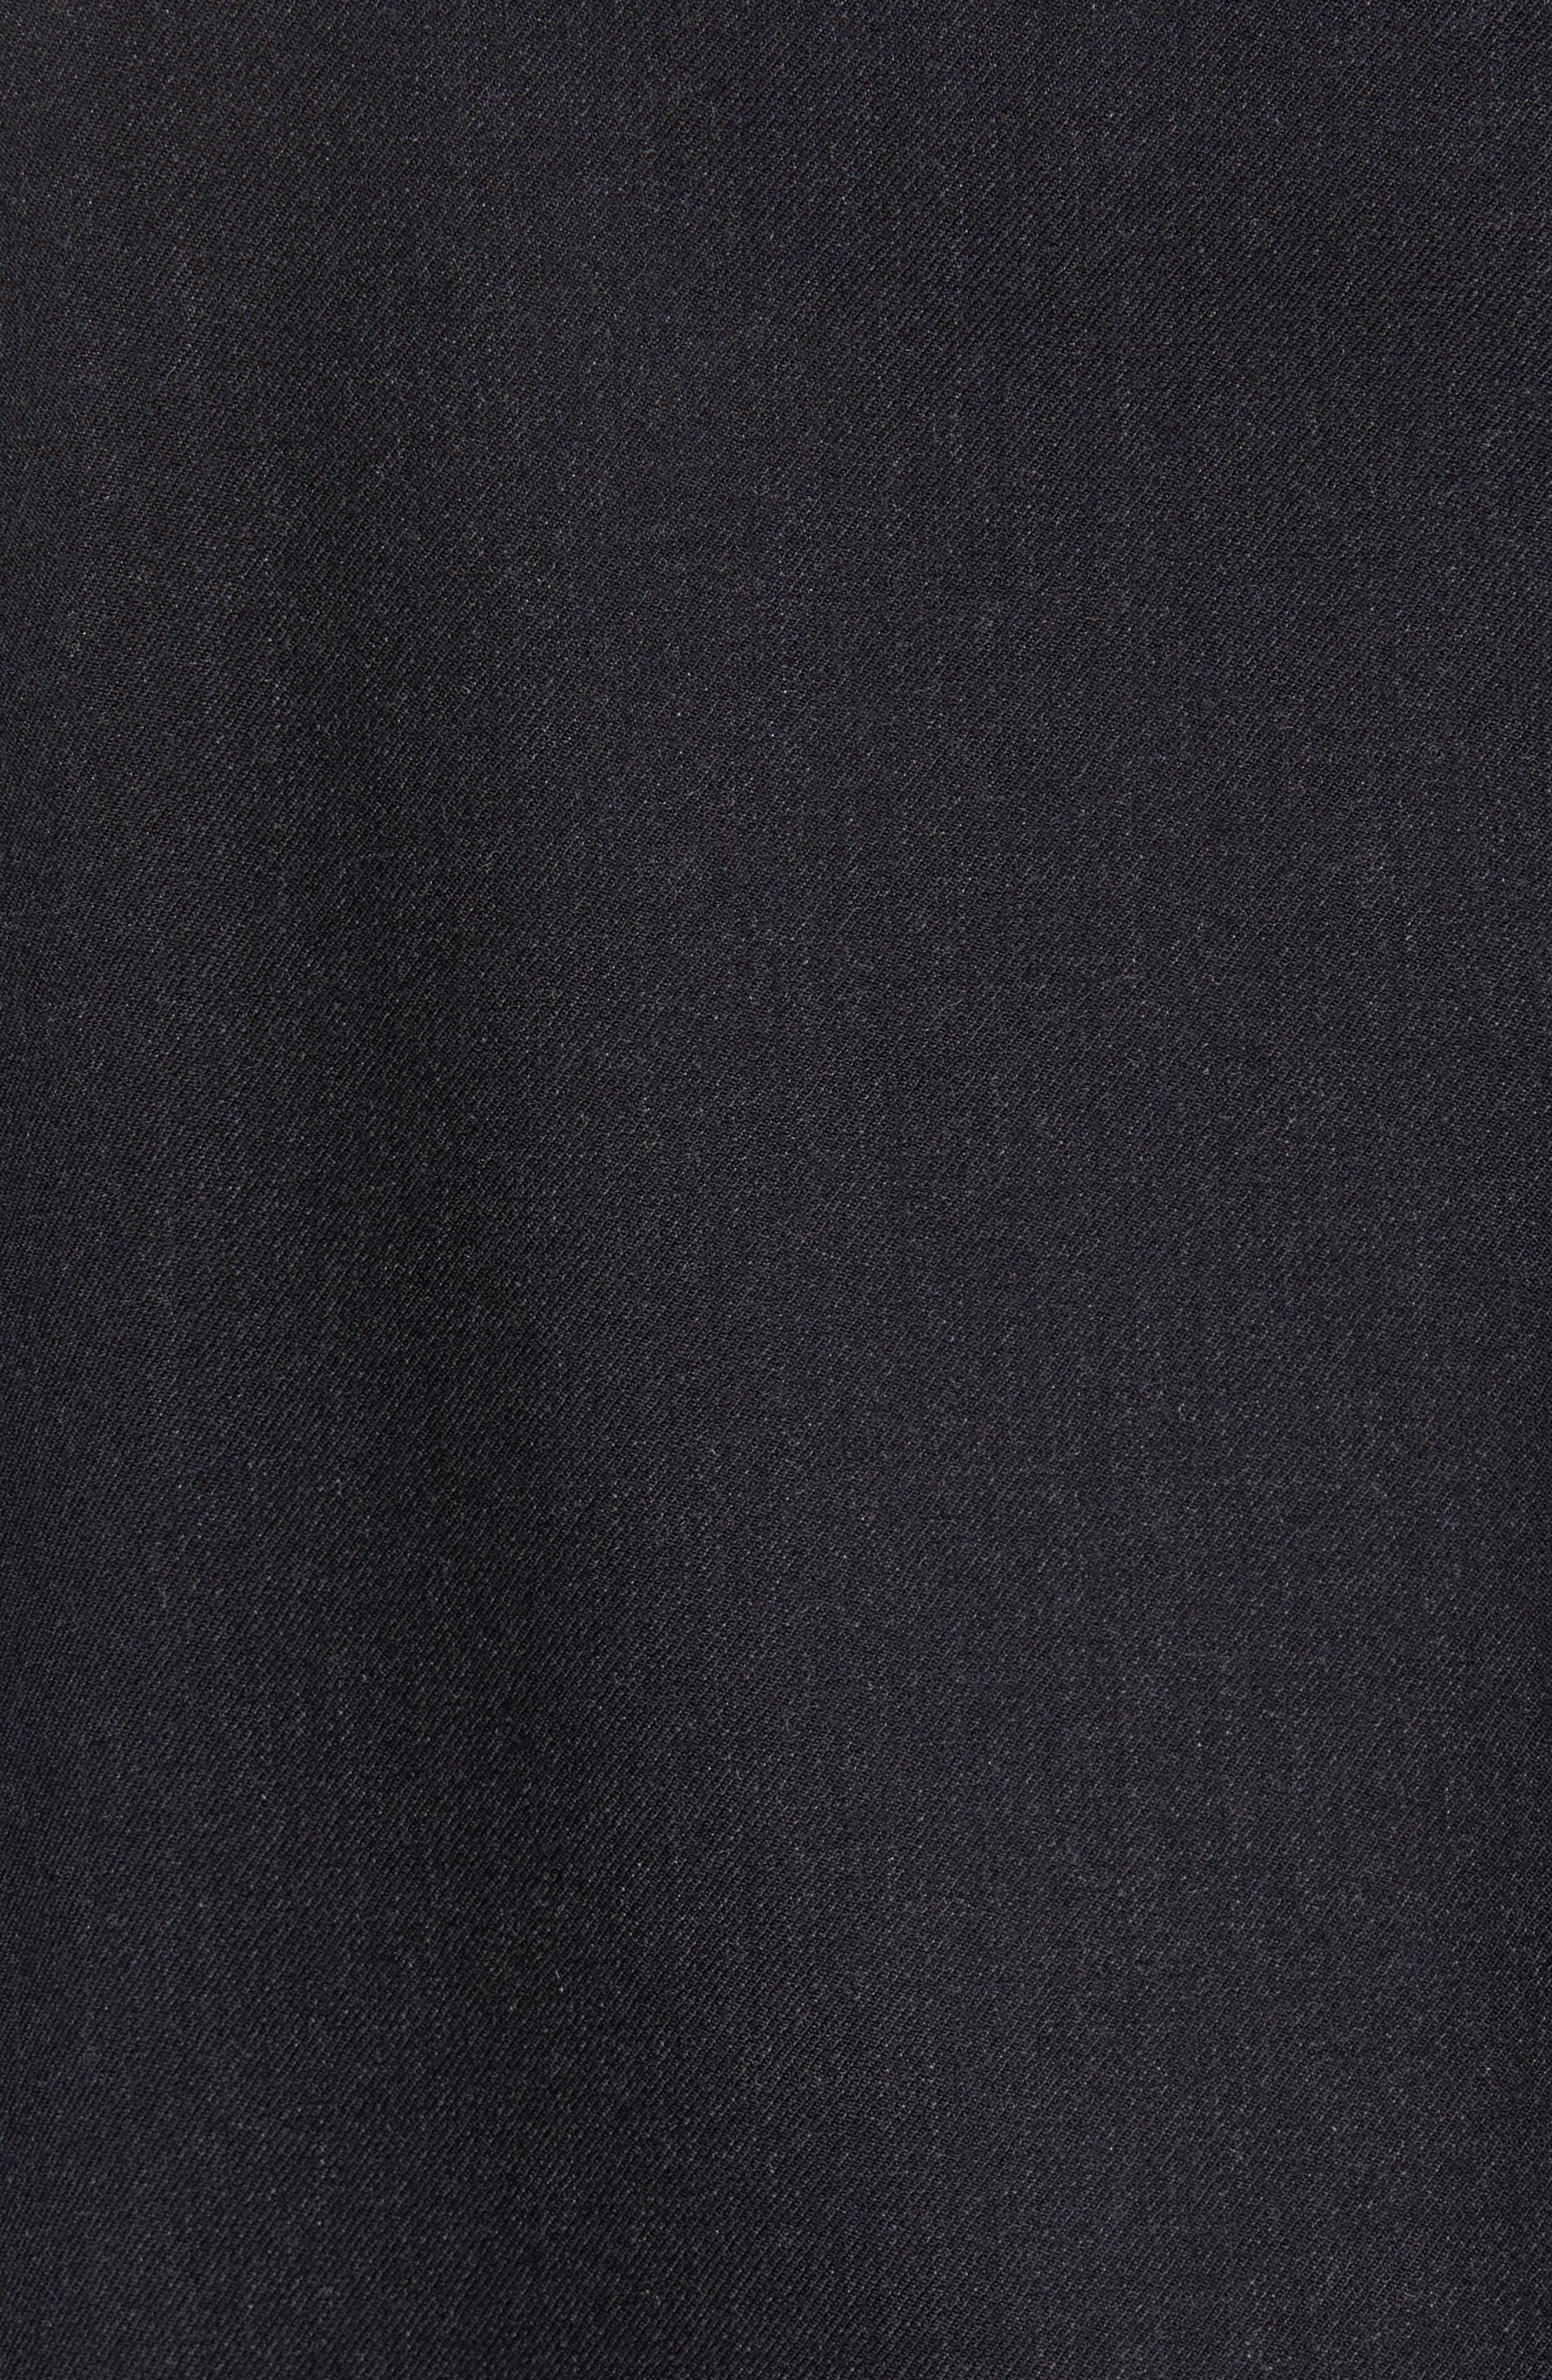 Regular Fit Blazer,                             Alternate thumbnail 5, color,                             Charcoal